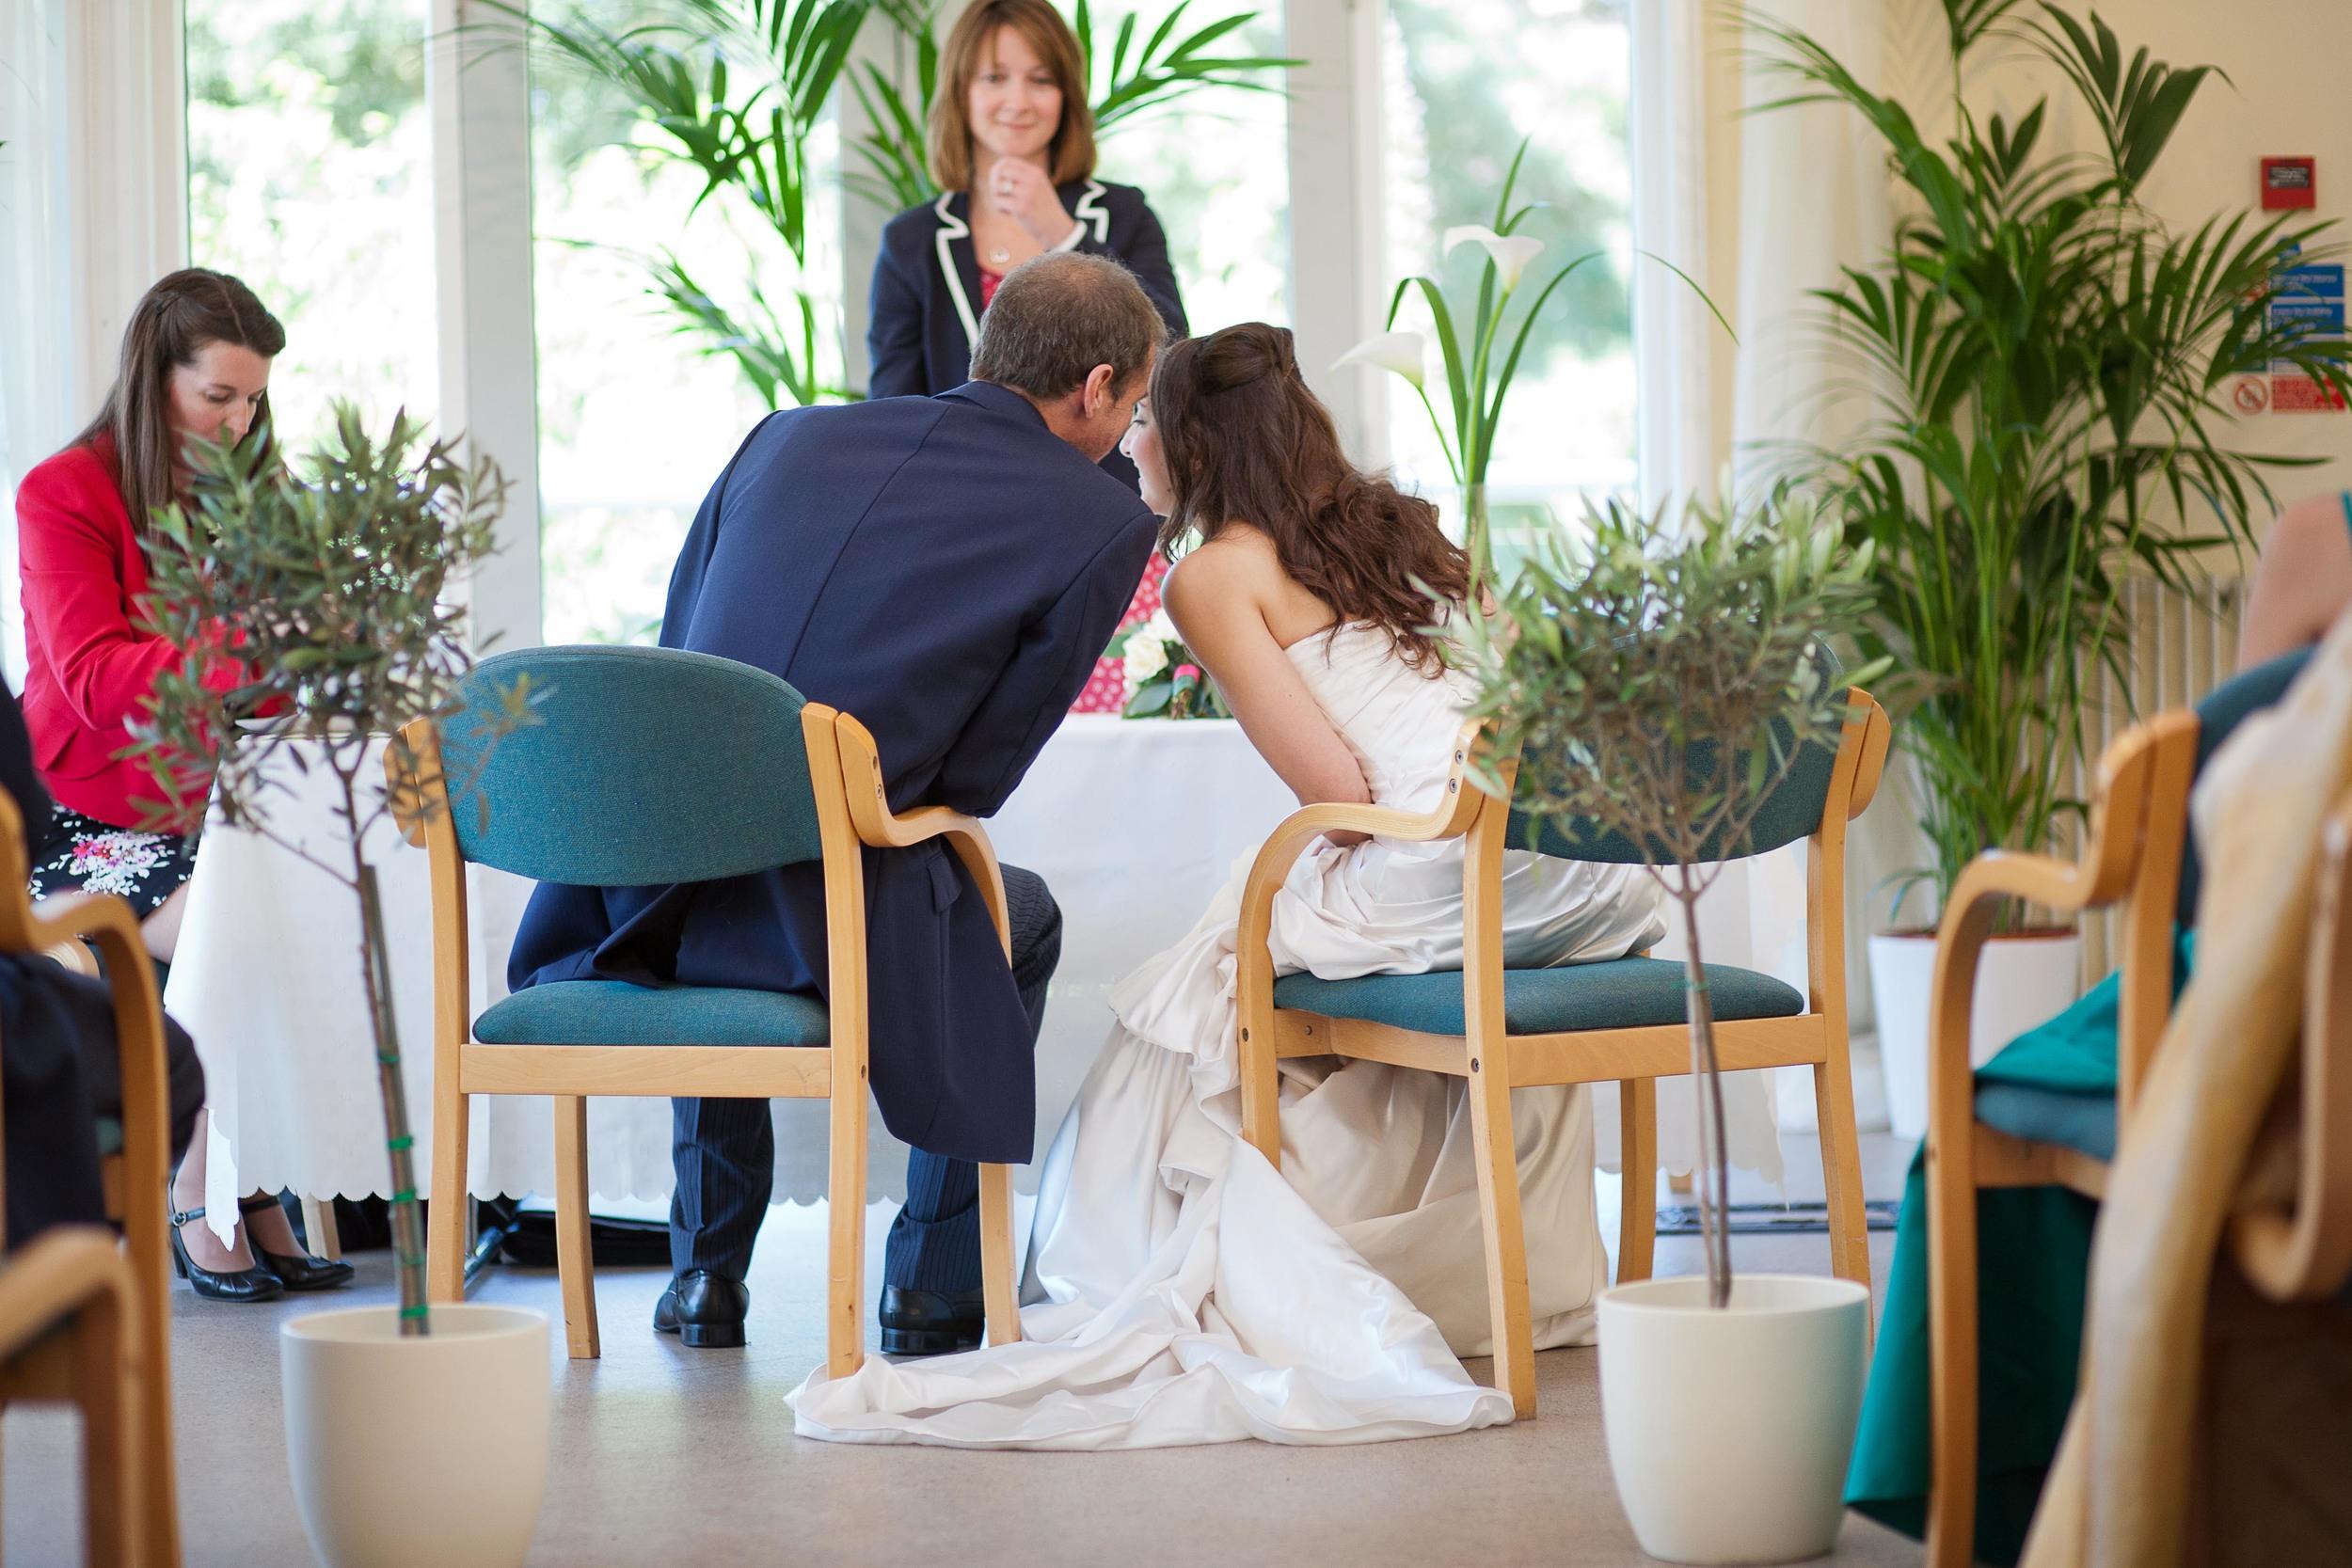 vbg-hughes-wedding-60.jpg